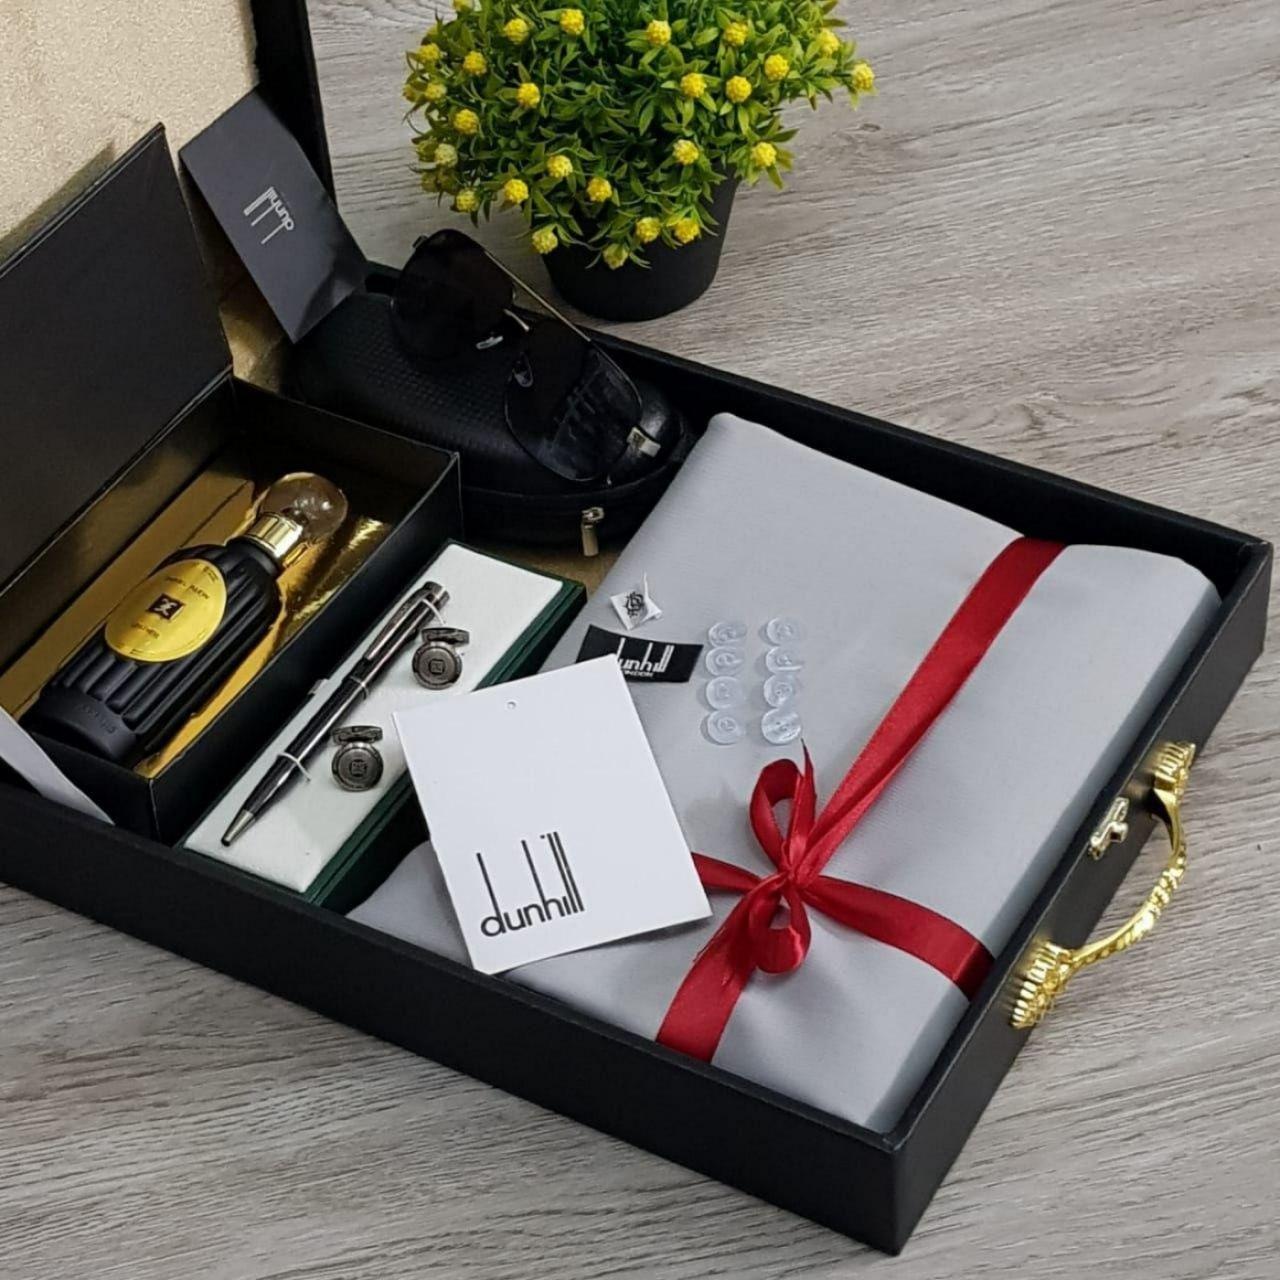 قماش دنهل رجالي Dunhill شتوي مع قلم و كبك و نظارات و عطر هدايا هنوف Gifts Hermes Kelly Top Handle Bag